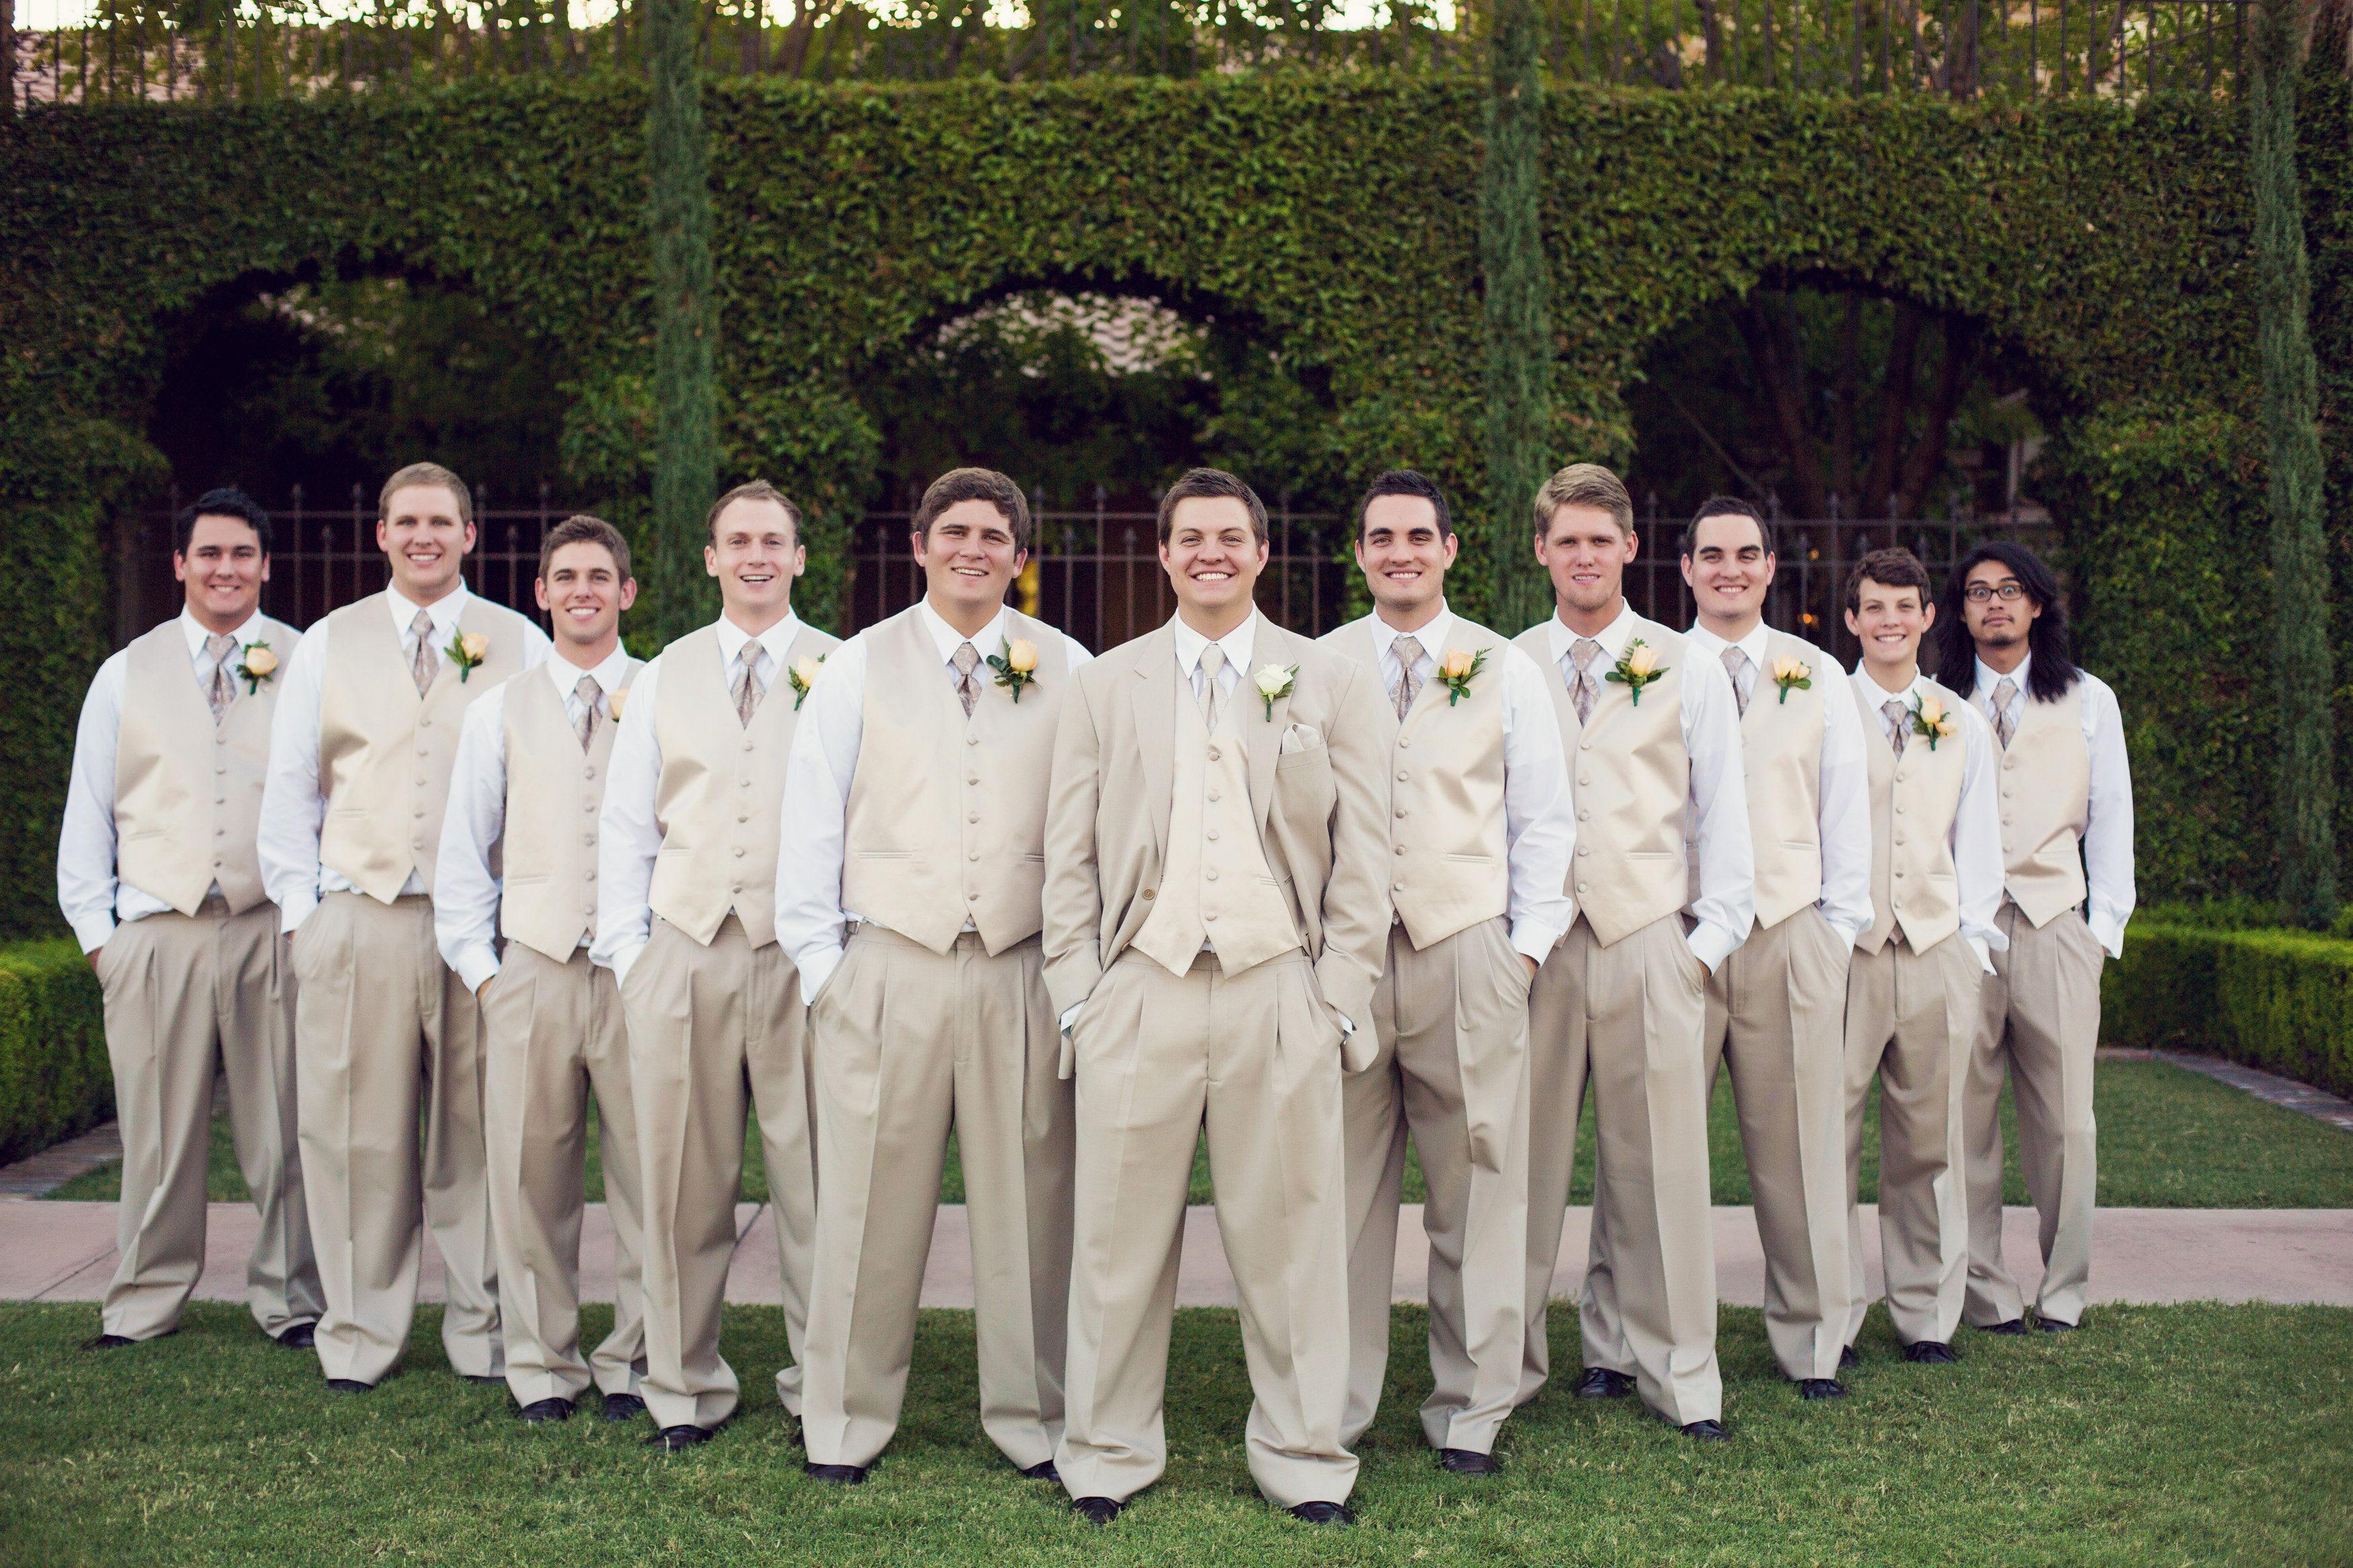 The groom and his groomsmen in khaki tuxedos | villasiena.cc ...